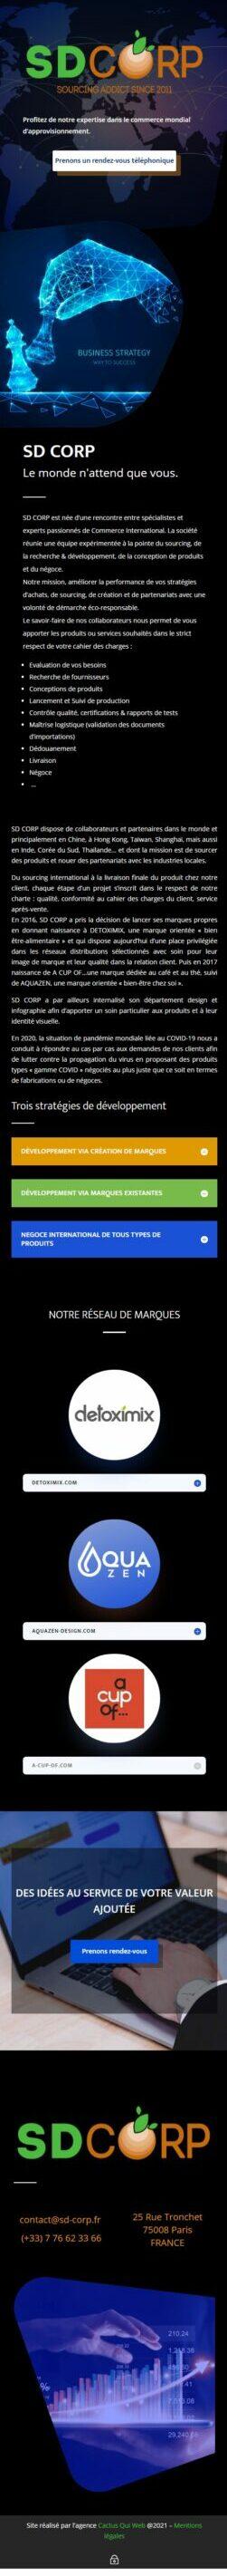 Vue mobile Accueil SD Corp sd corp fr